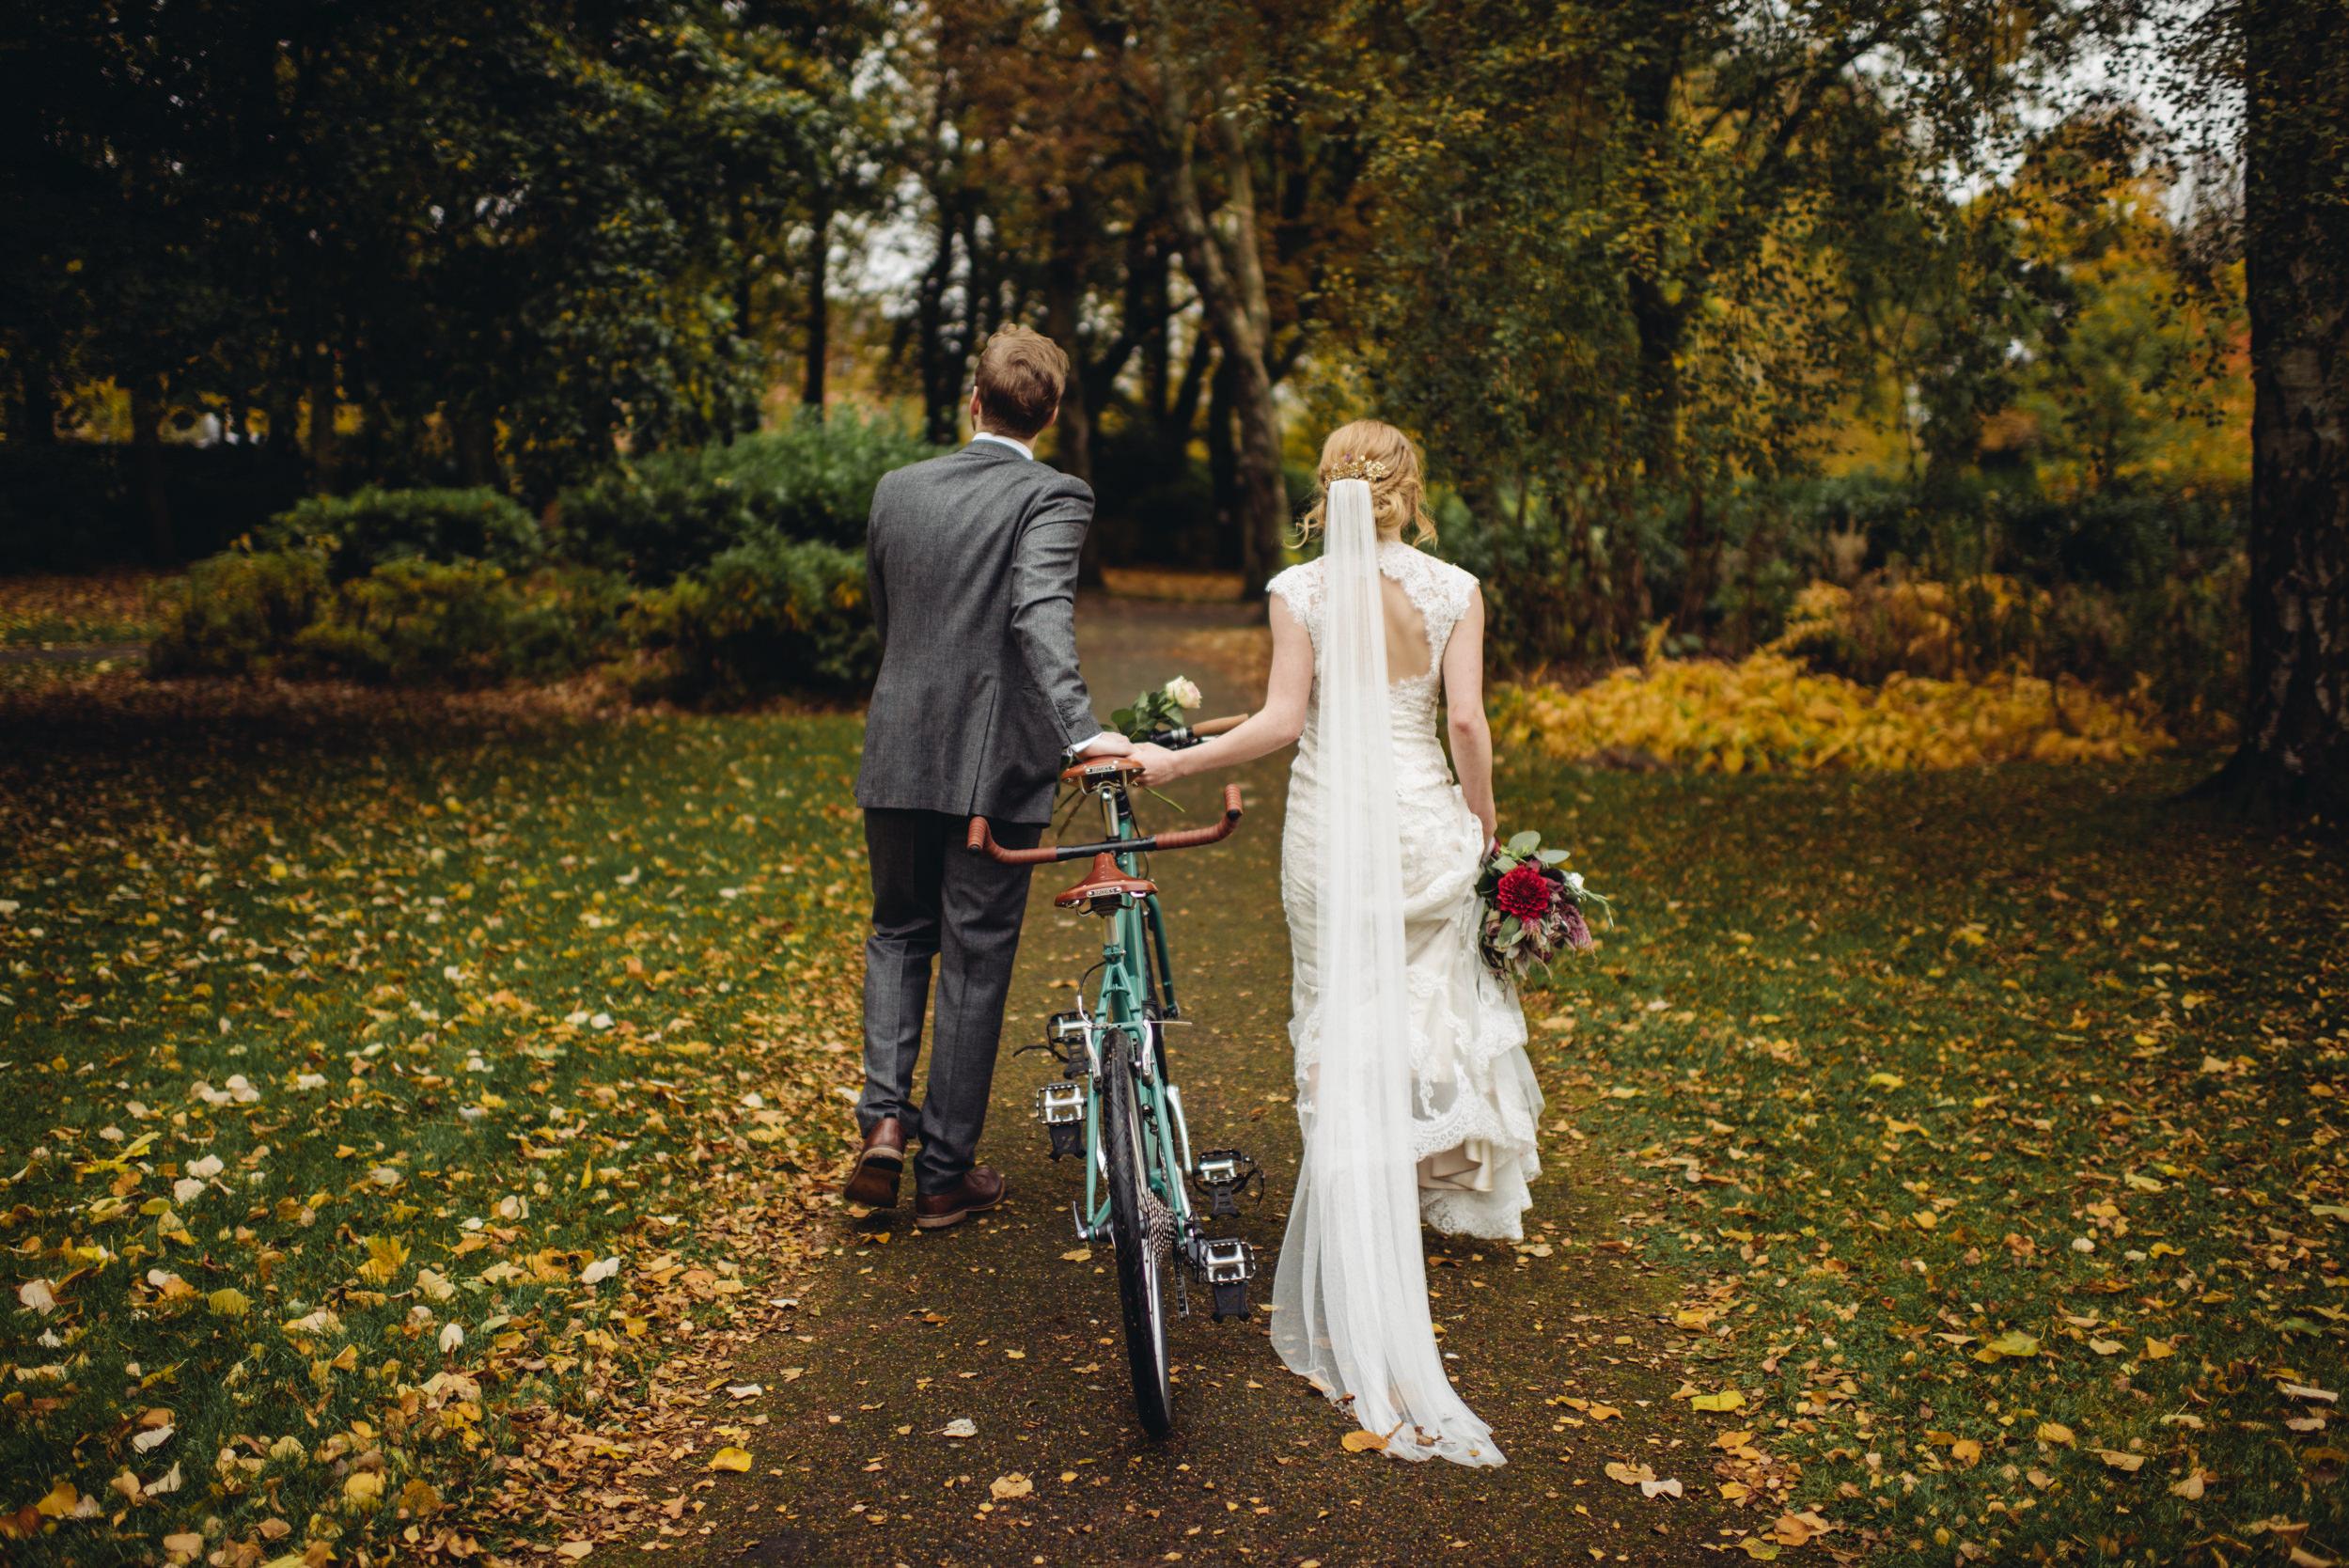 0182-alternative-wedding-portrait-family-kids-photographer-glasgow-scotland.JPG